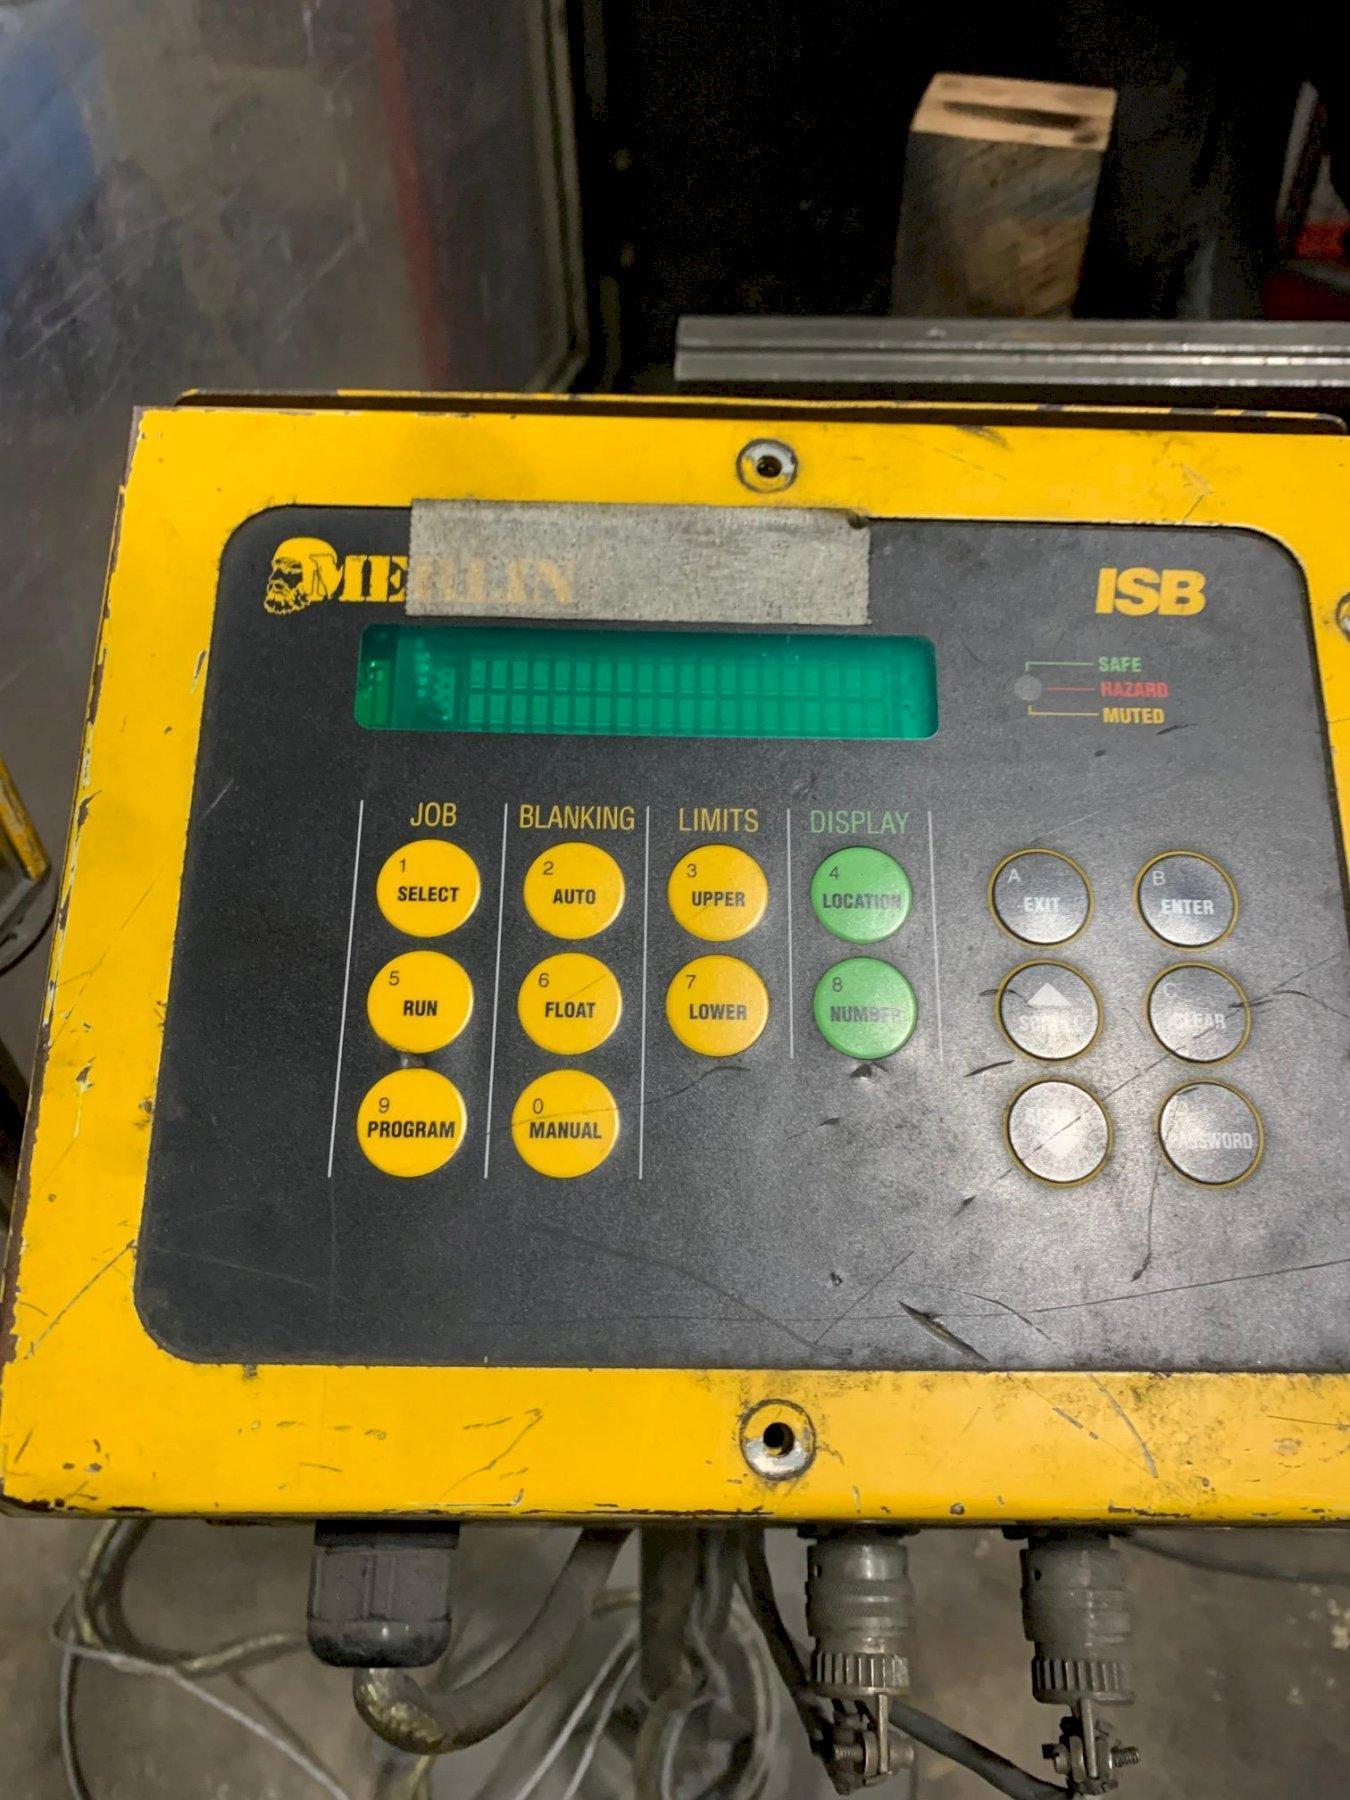 USED AMADA 143 TON X 10' MODEL HFE 1303 6-AXIS HYDRAULIC DOWNACTING CNC PRESS BRAKE, Stock# 1073